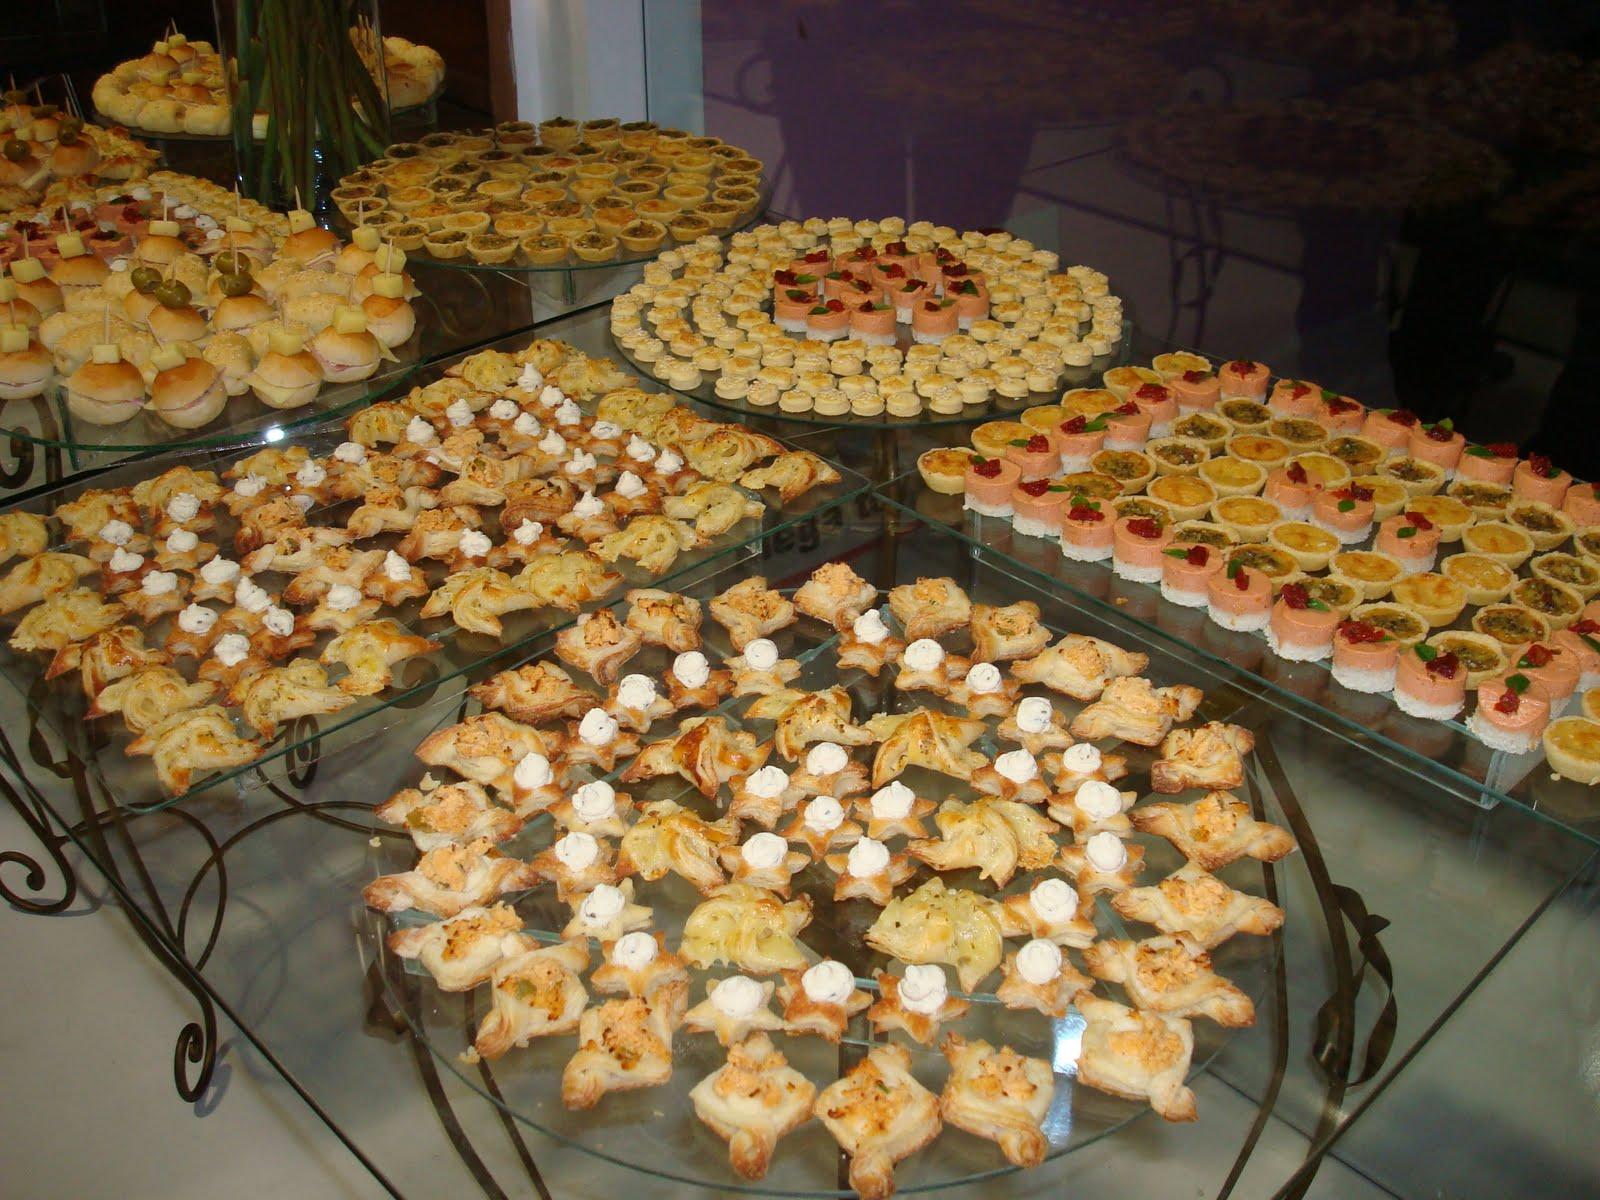 Country house buffet o que servir for Servir comida